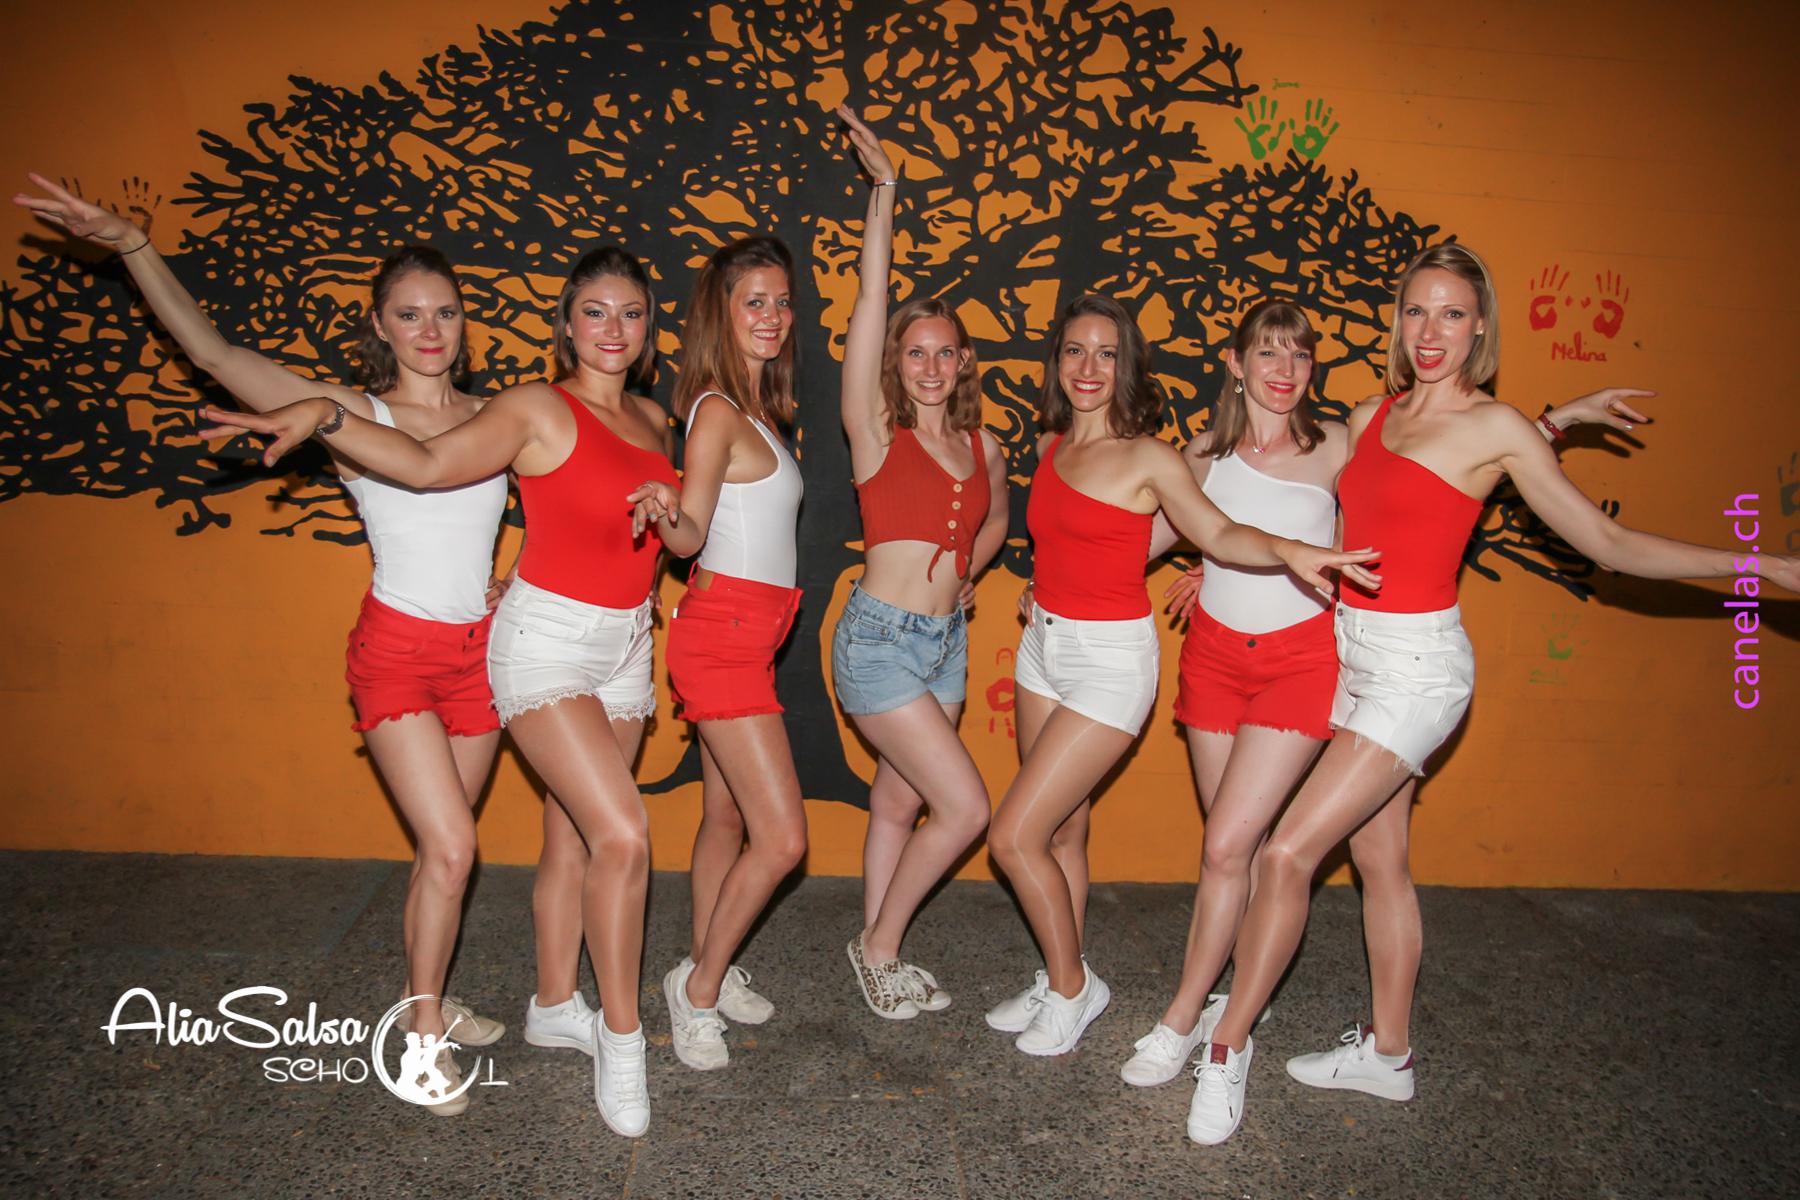 AliaSalsa ecole de danse lausanne soiree bachata salsa cubaineAlia Salsa Soireé Salsa - Bachata-31